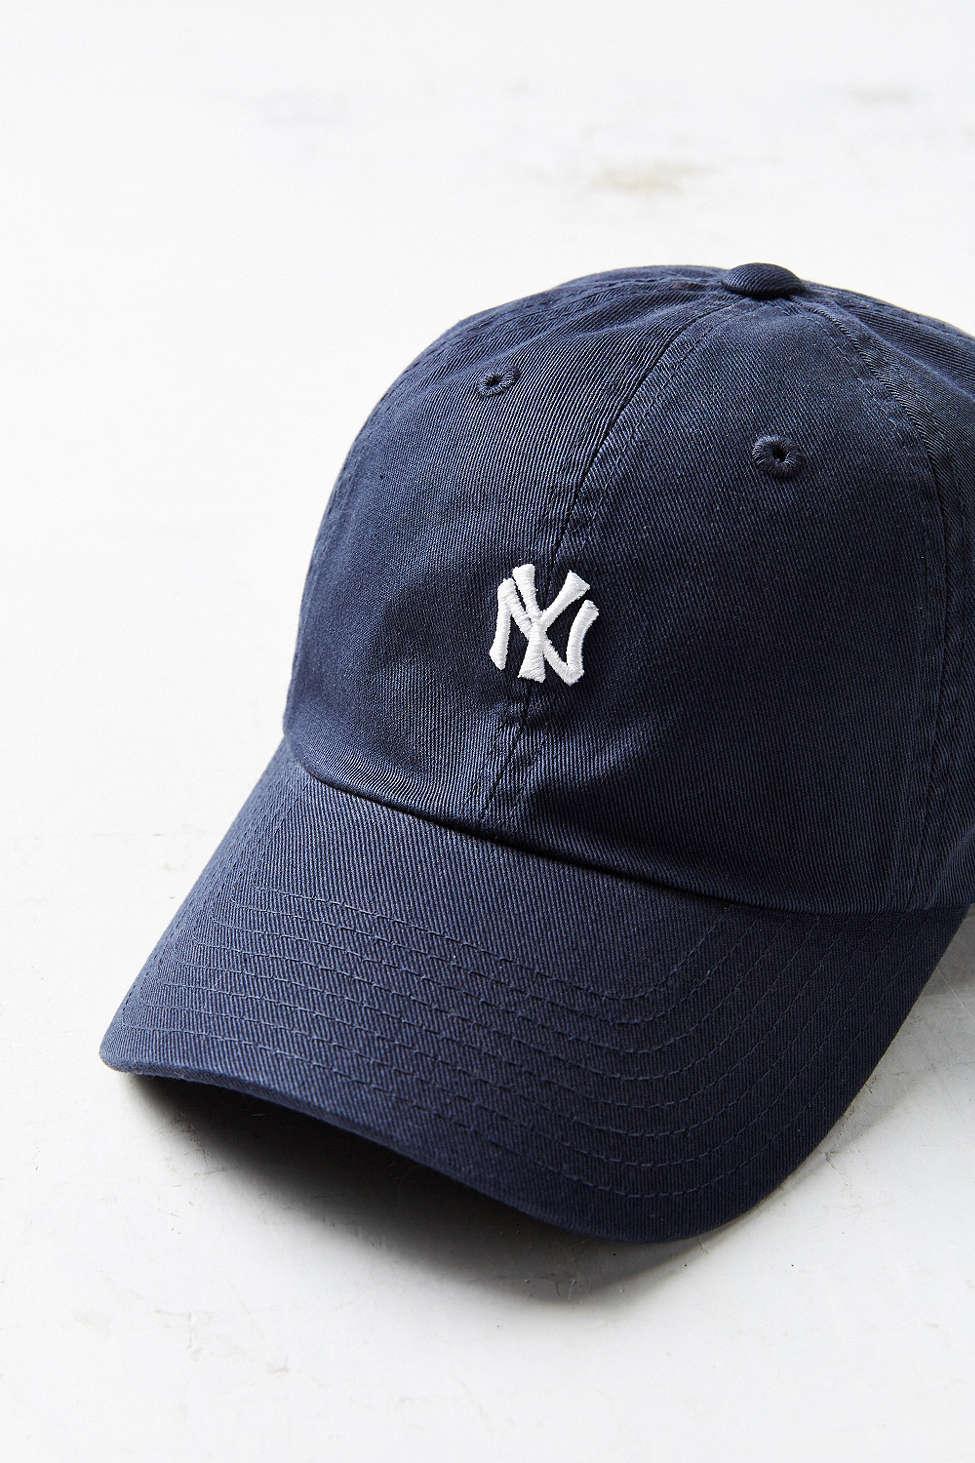 9f05cc0633d ... order lyst american needle classic micro ballpark variant baseball hat  cf065 2badd